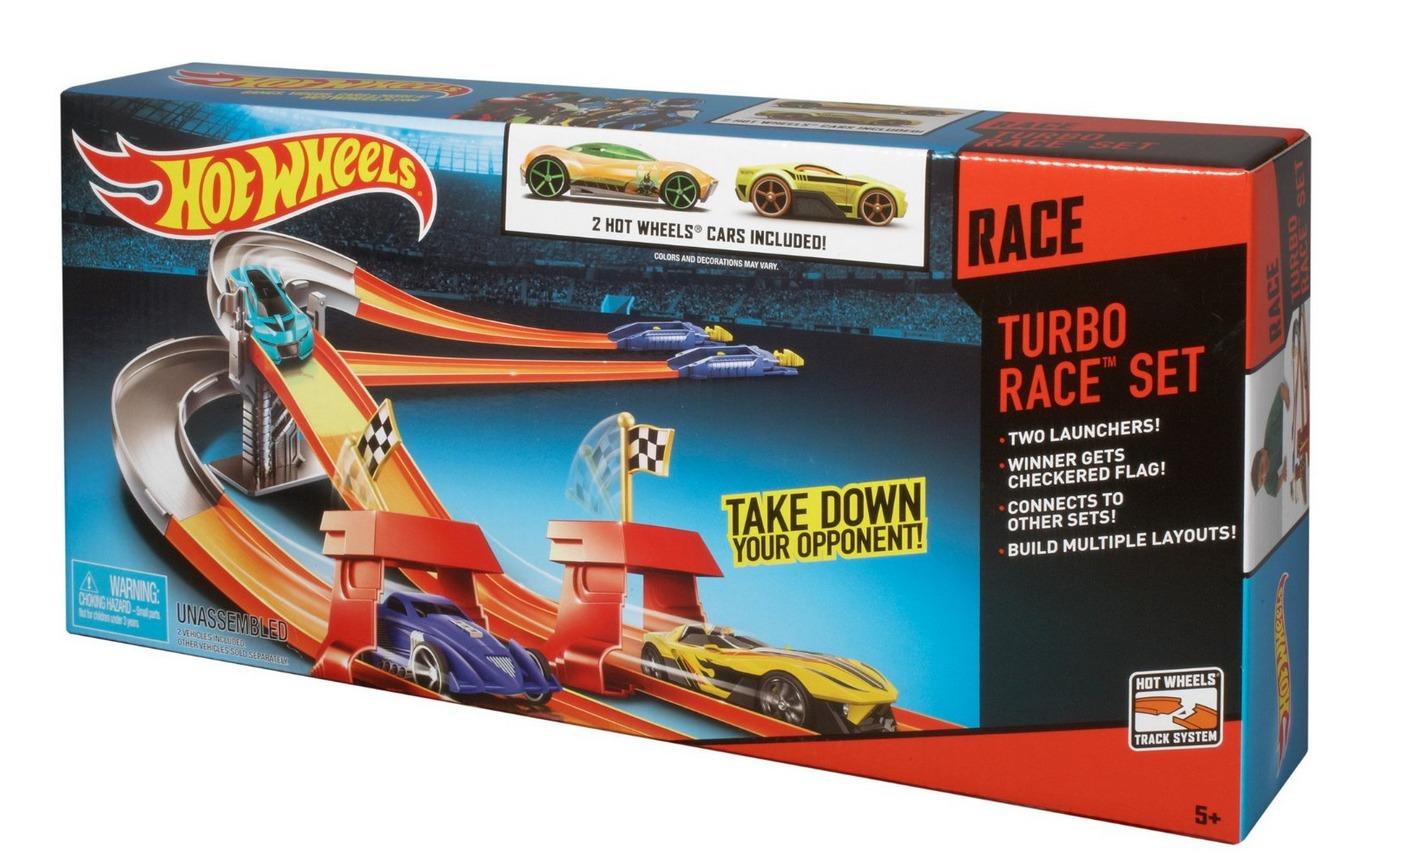 Hot Wheels Turbo Race Set image